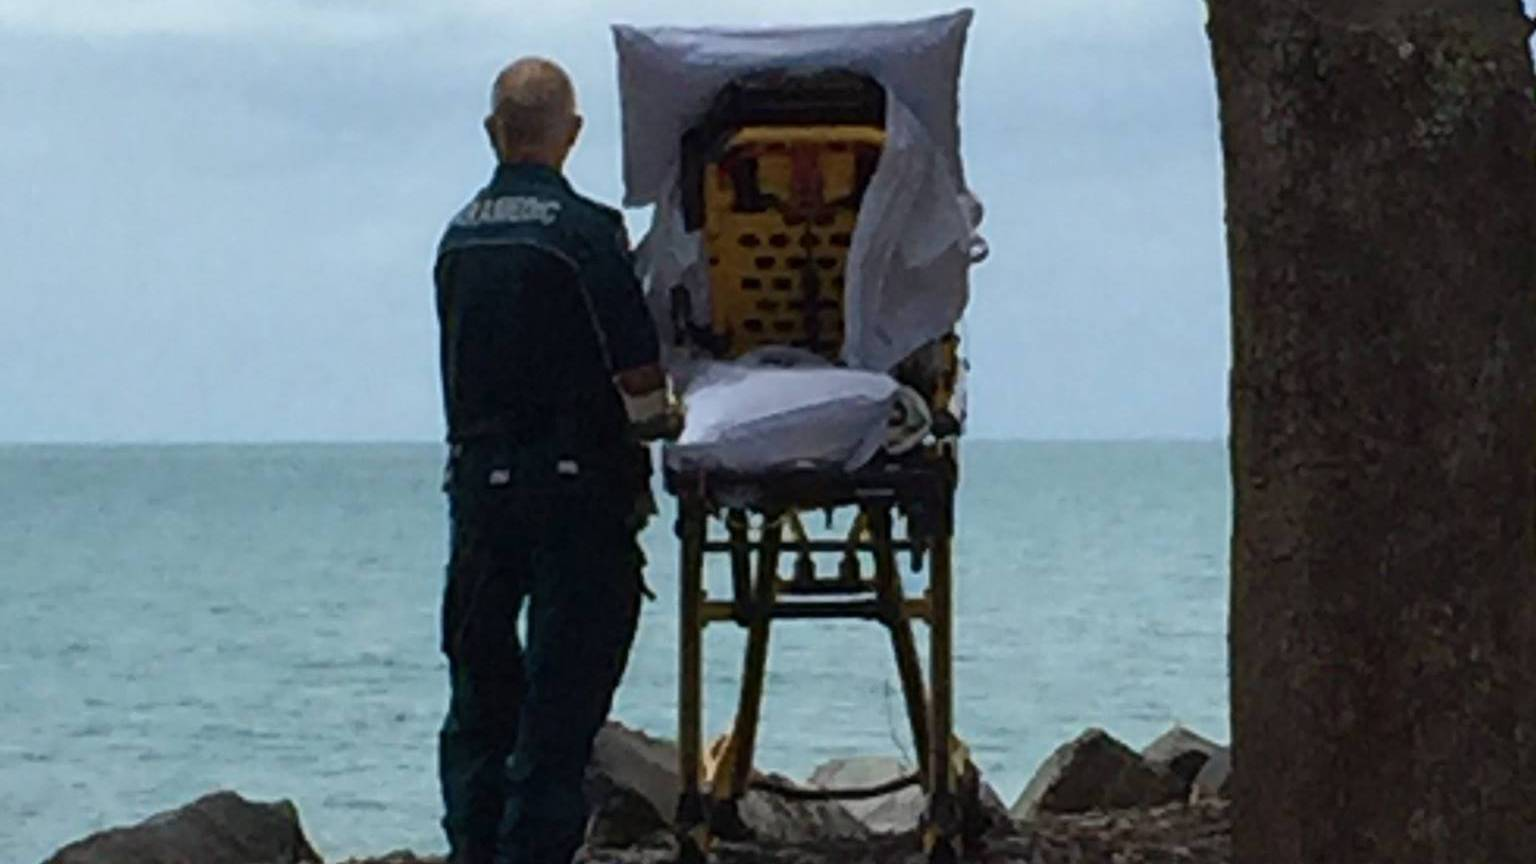 Queensland Ambulance Service Good News